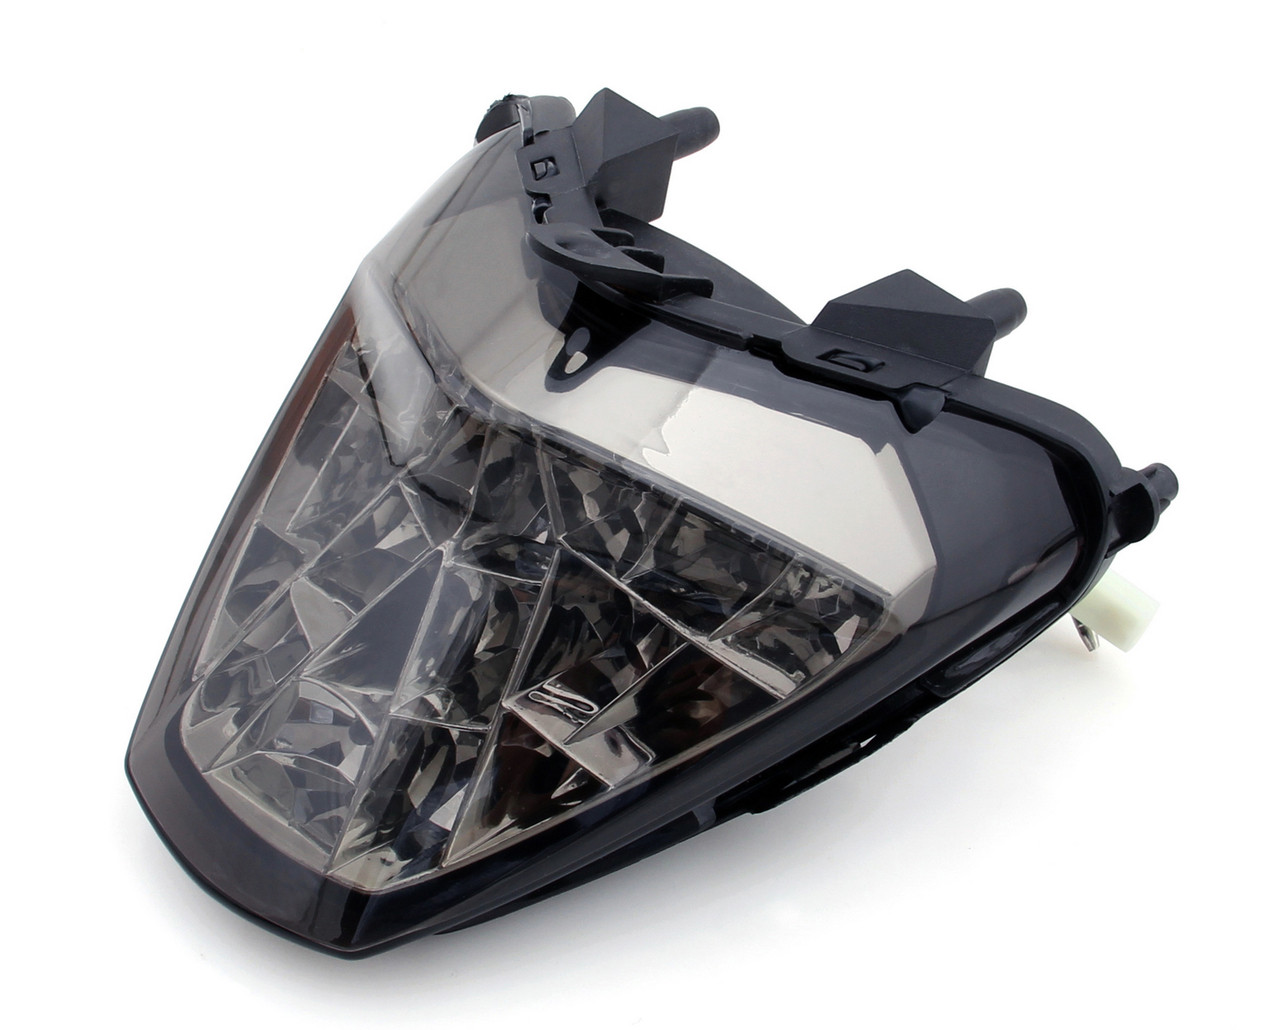 Integrated LED TailLight Turn Signals For Honda CBR250R 2010-2012 MC41 Smoke